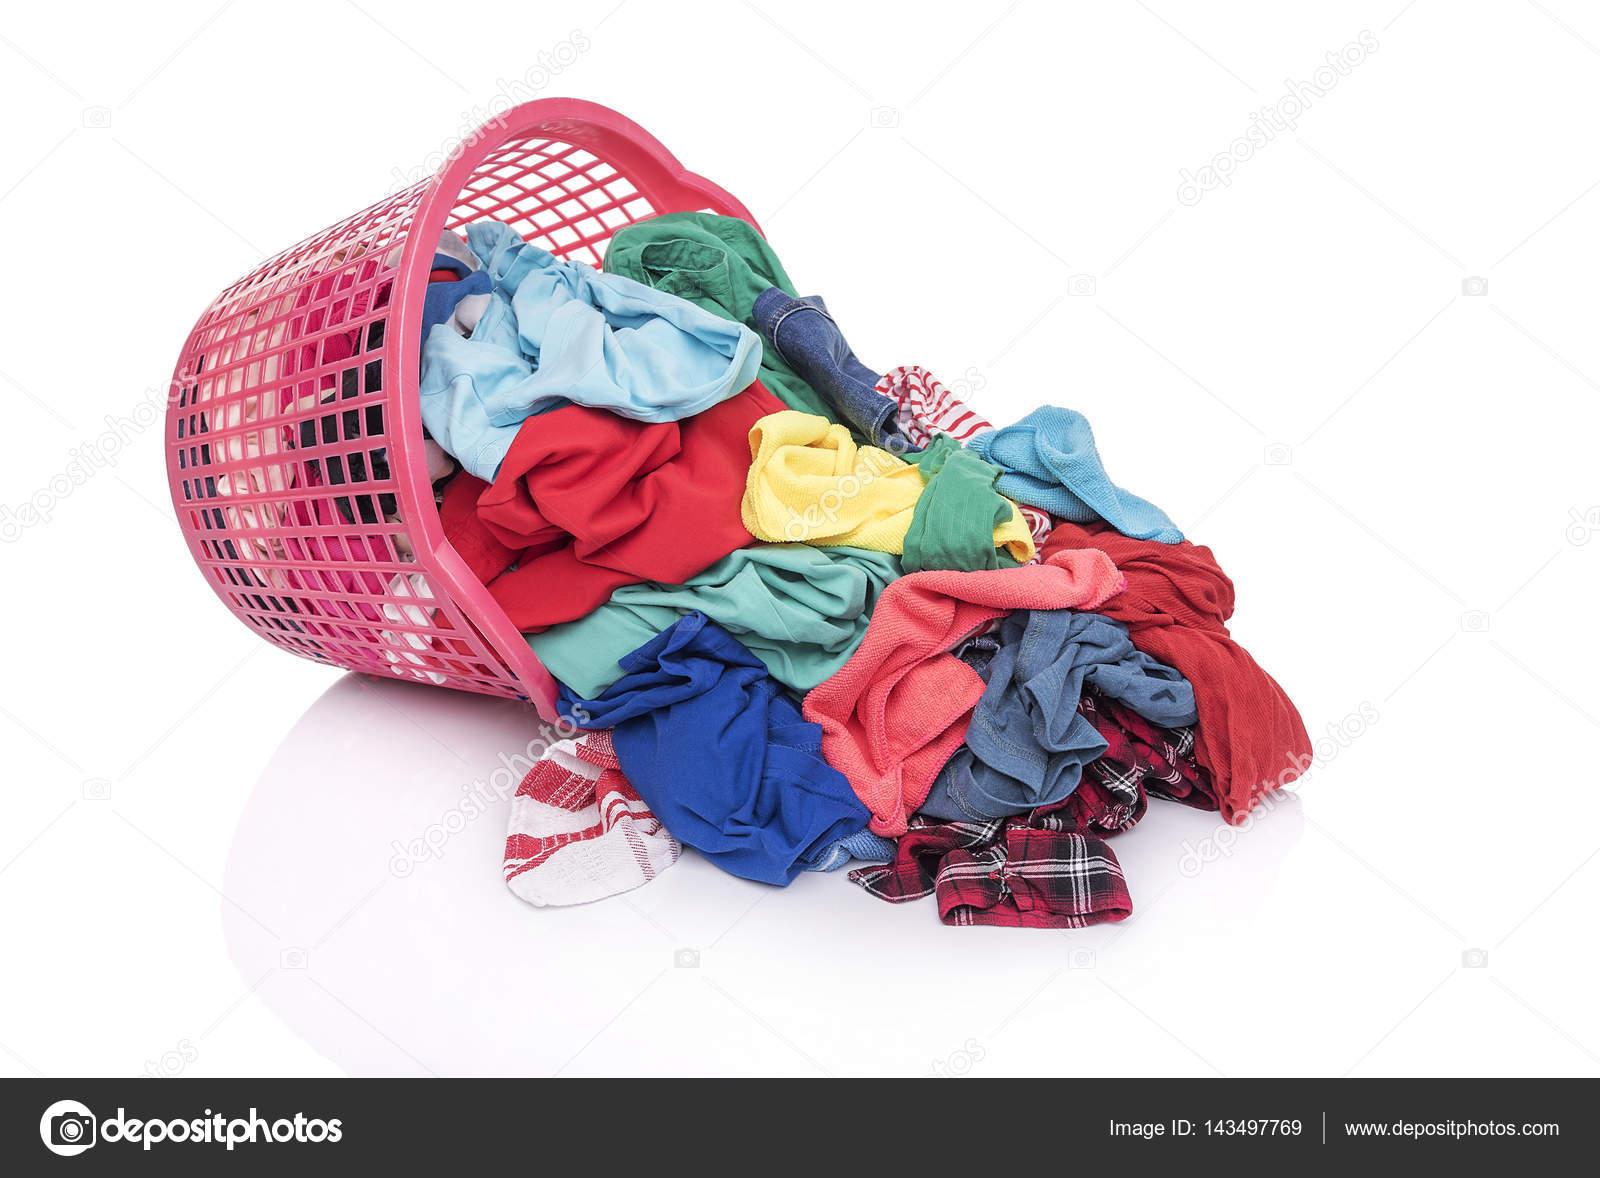 Im genes ropa sucia cesto de ropa sucia foto de stock - Cestos para ropa sucia ...